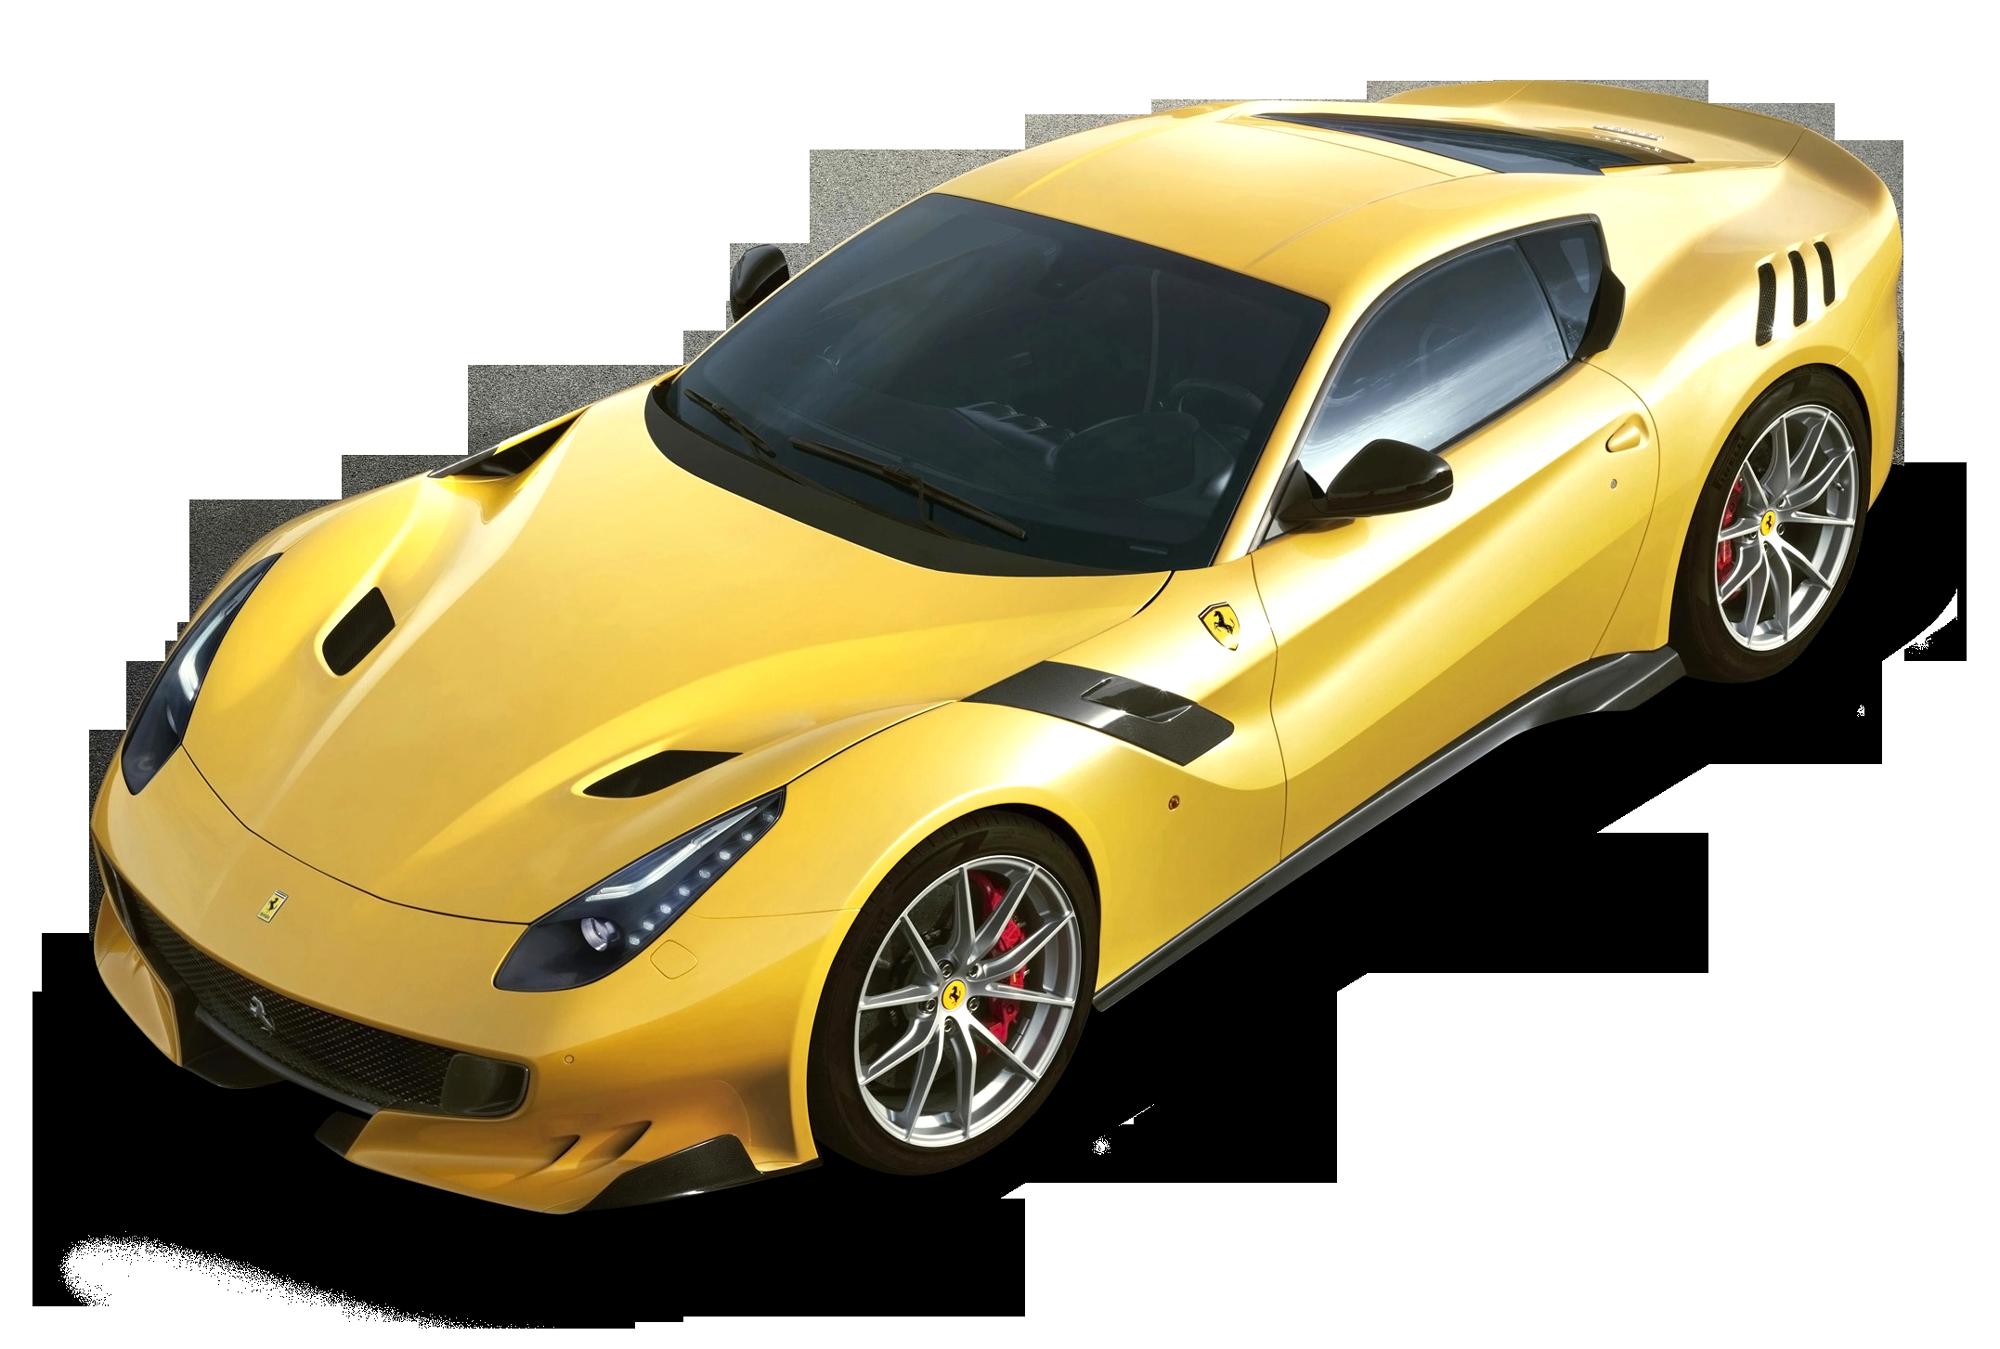 ferrari f12tdf yellow car png image purepng free transparent cc0